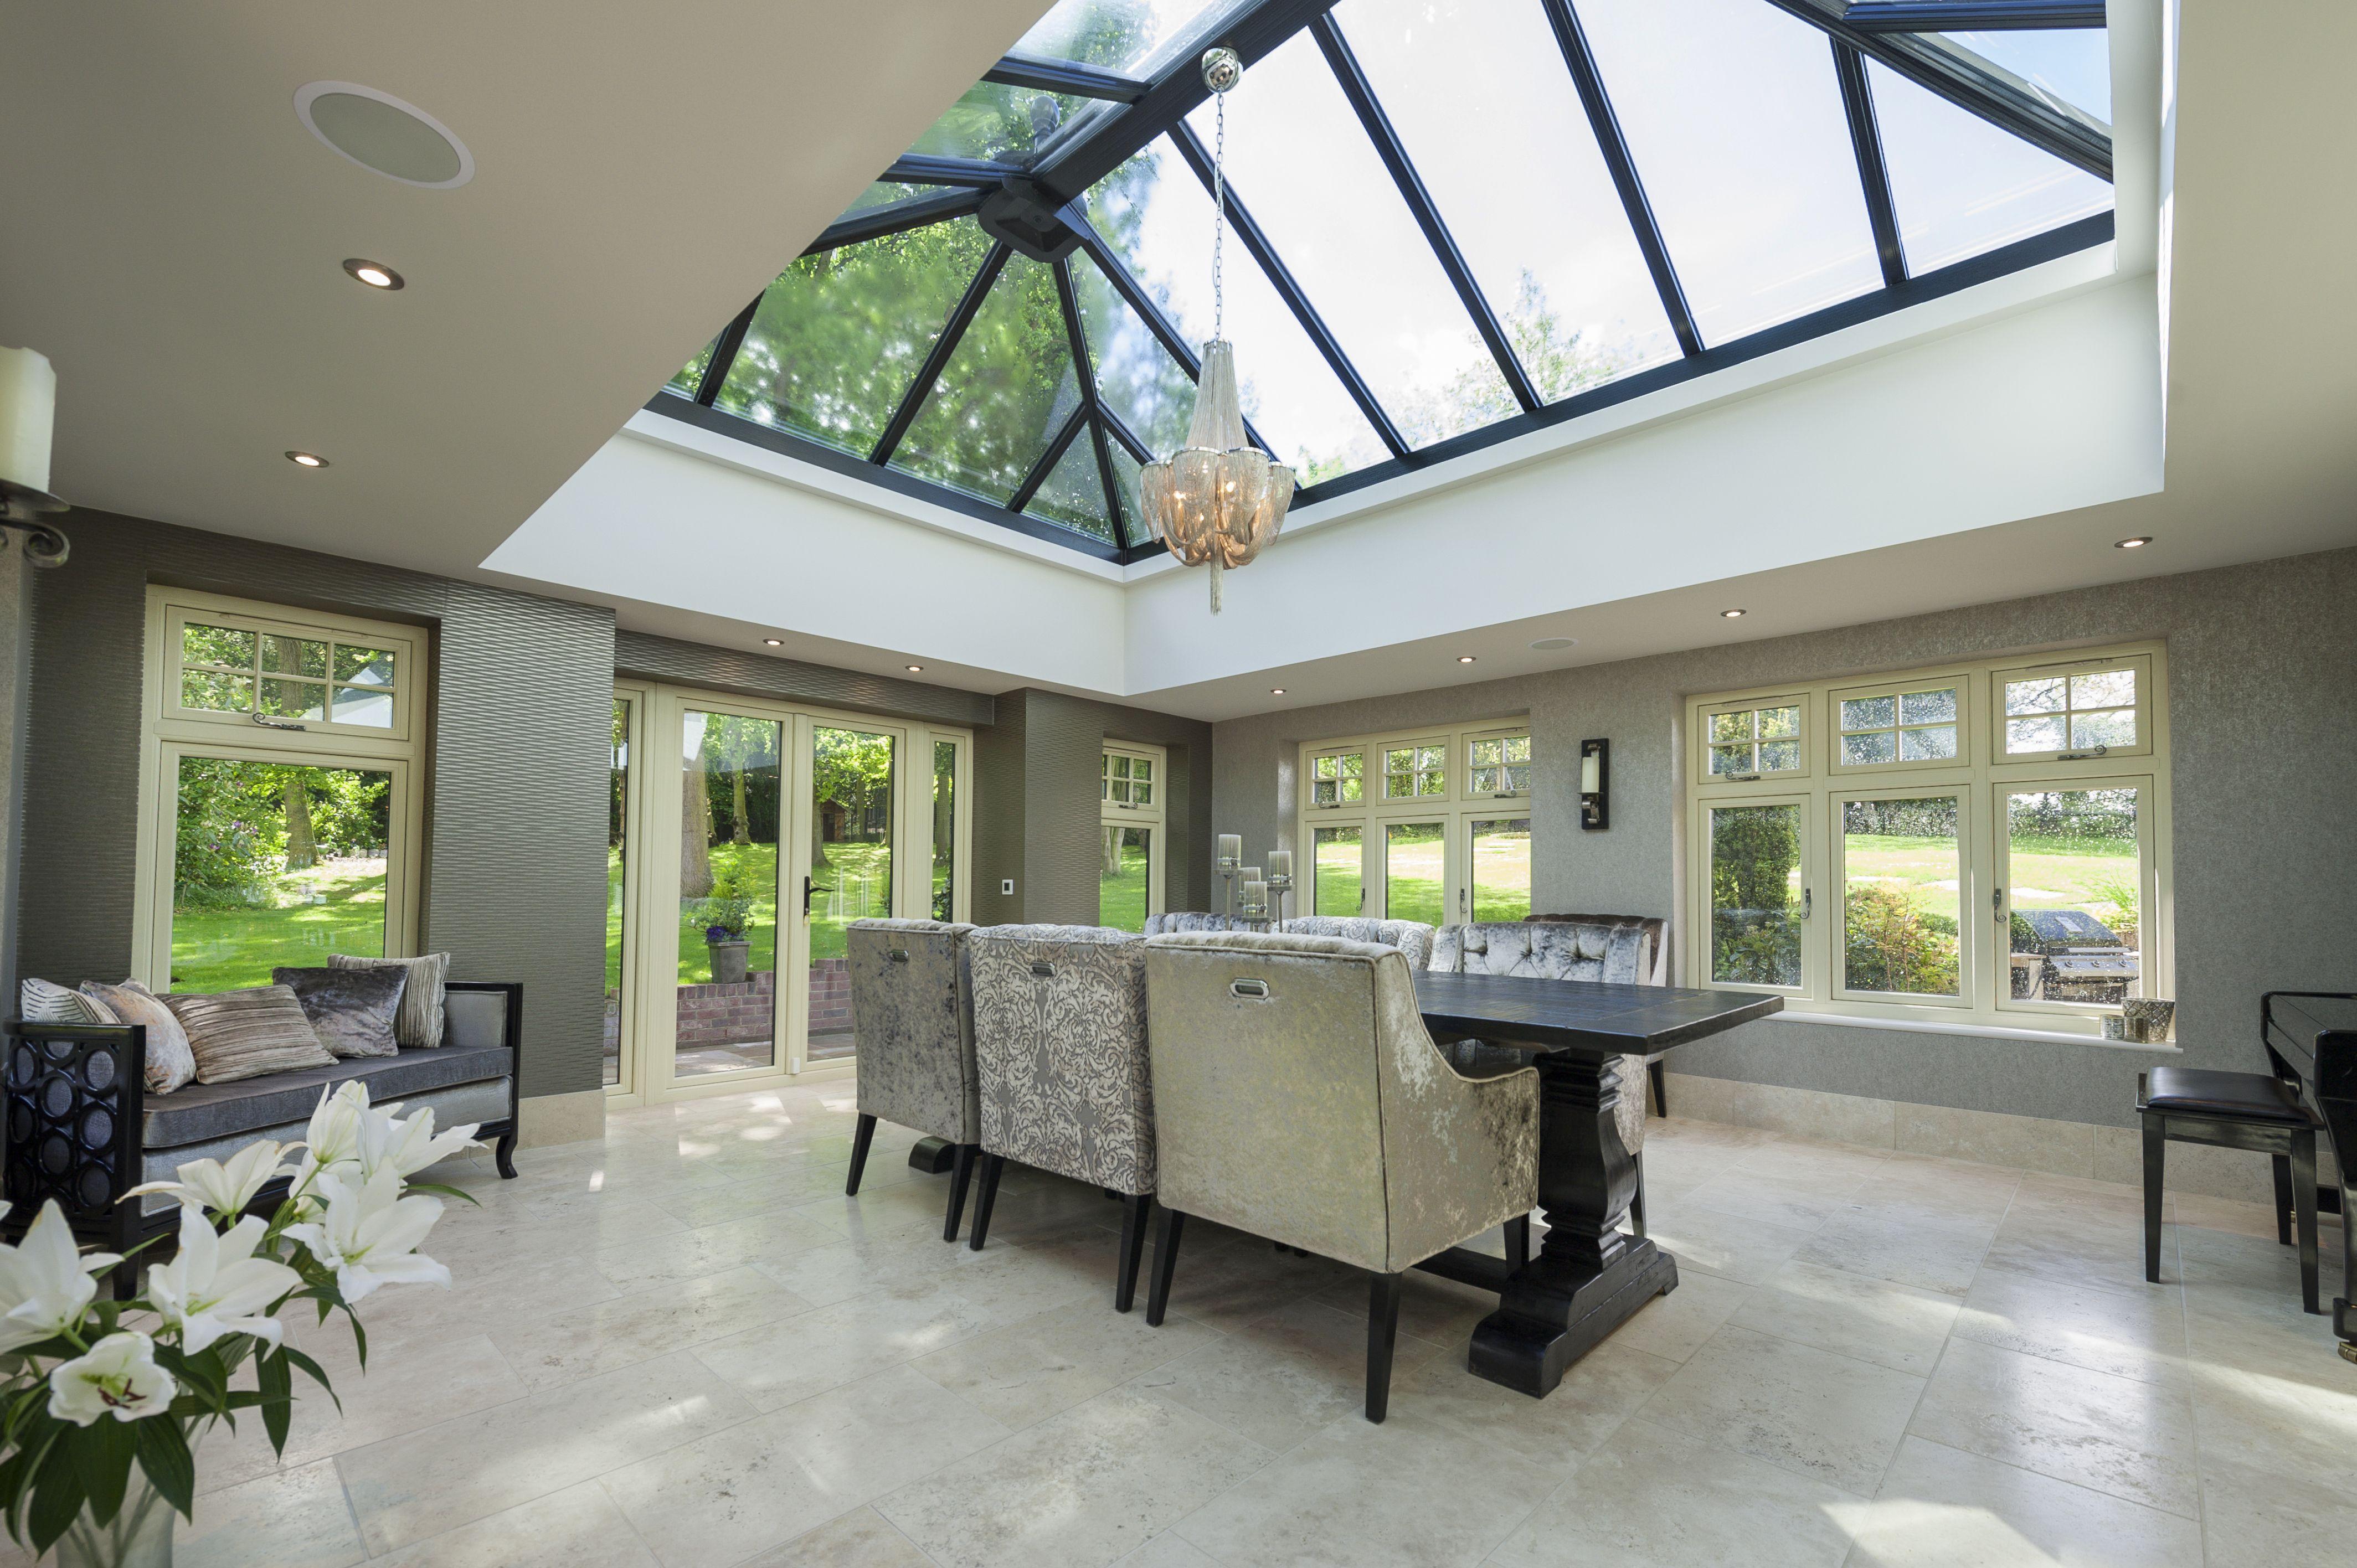 Beautiful modern residence orangery love these stylish